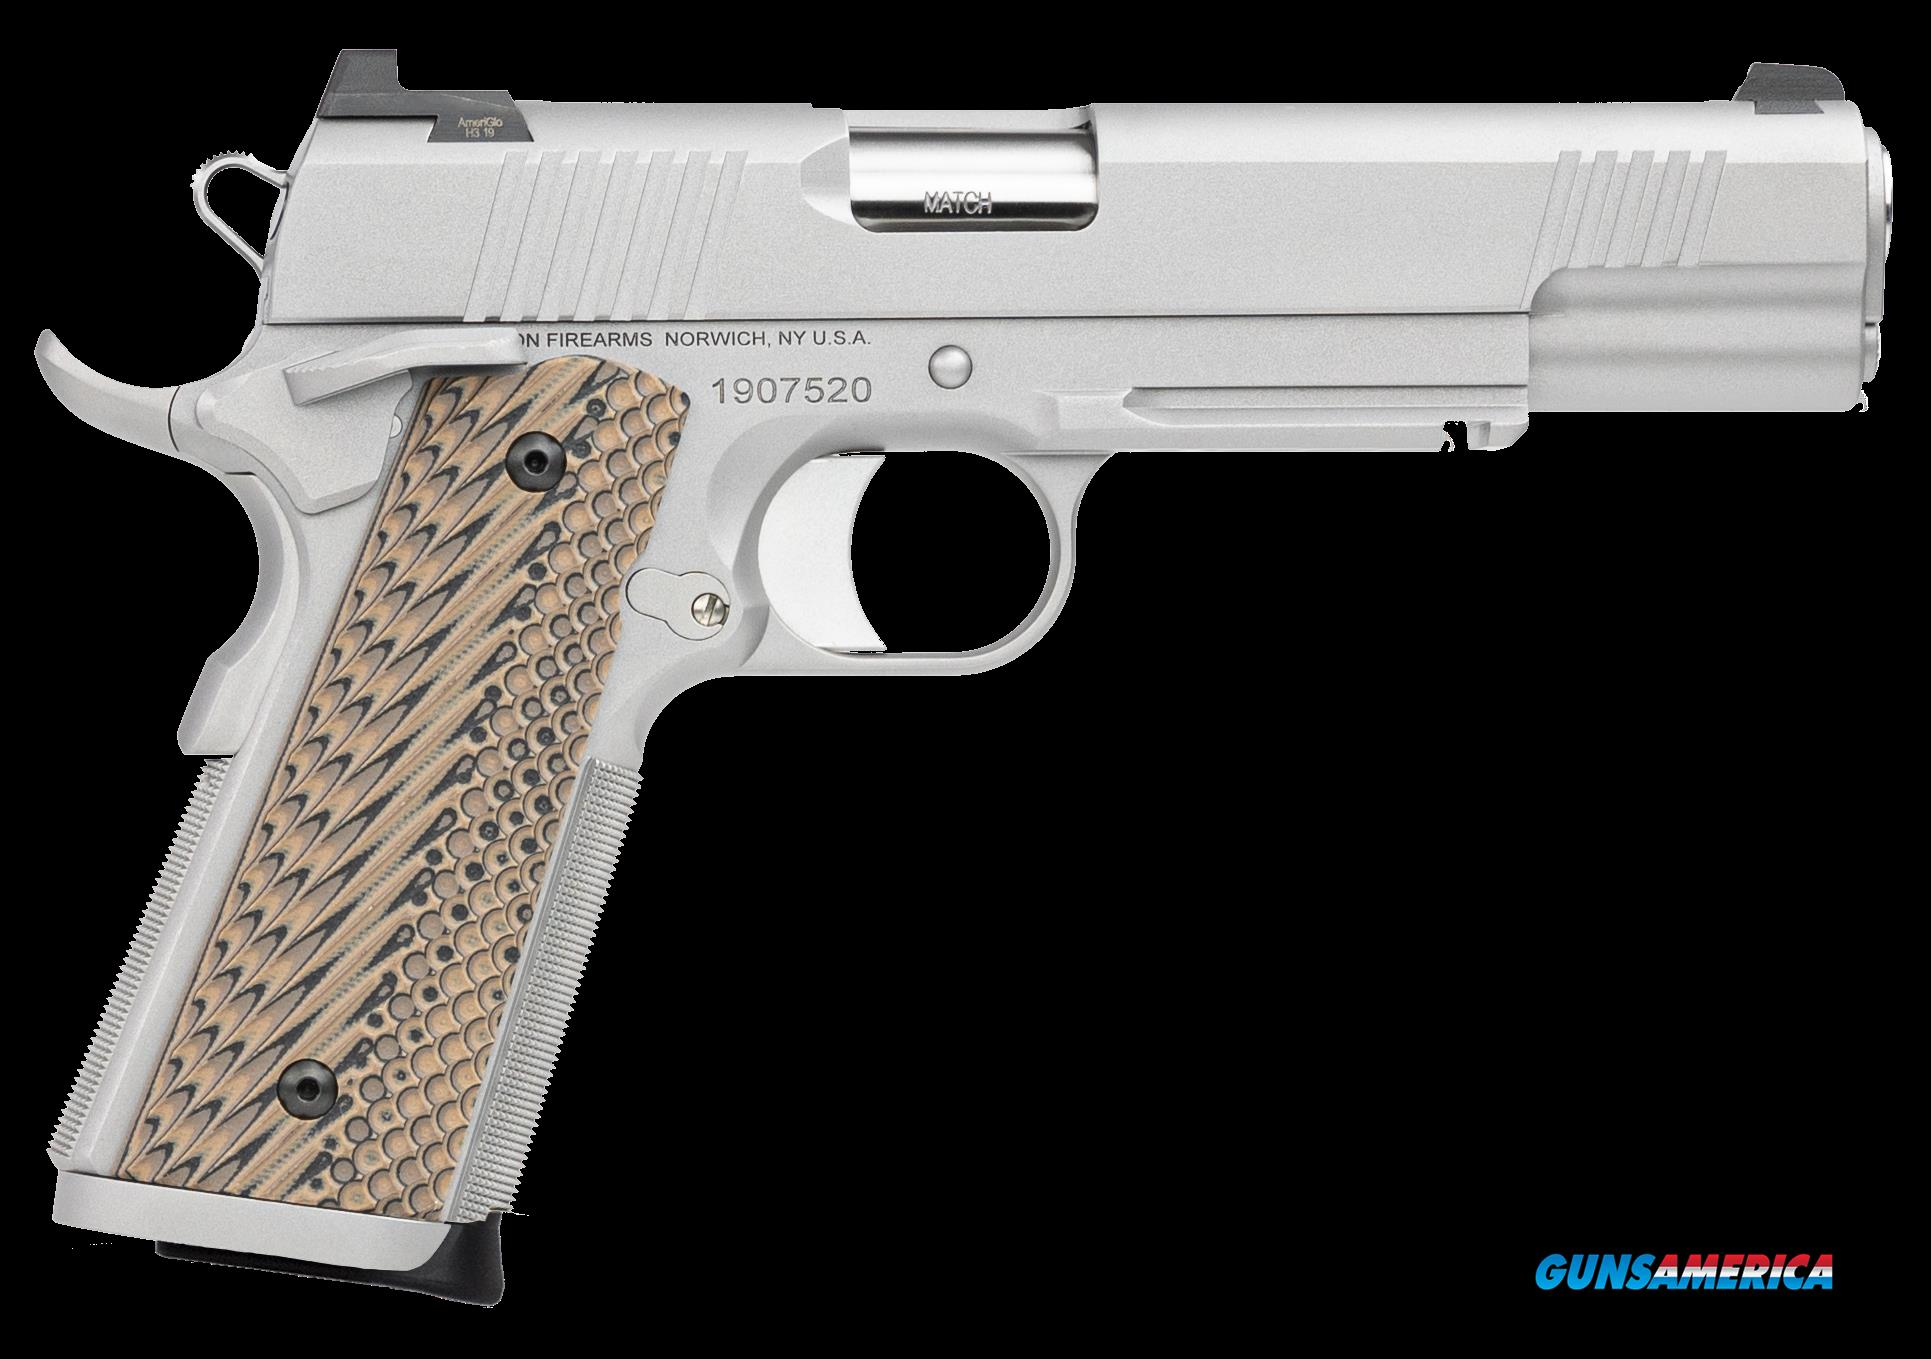 Dan Wesson Specialist, Dan 01814 Specialist        10m Blk  Guns > Pistols > 1911 Pistol Copies (non-Colt)